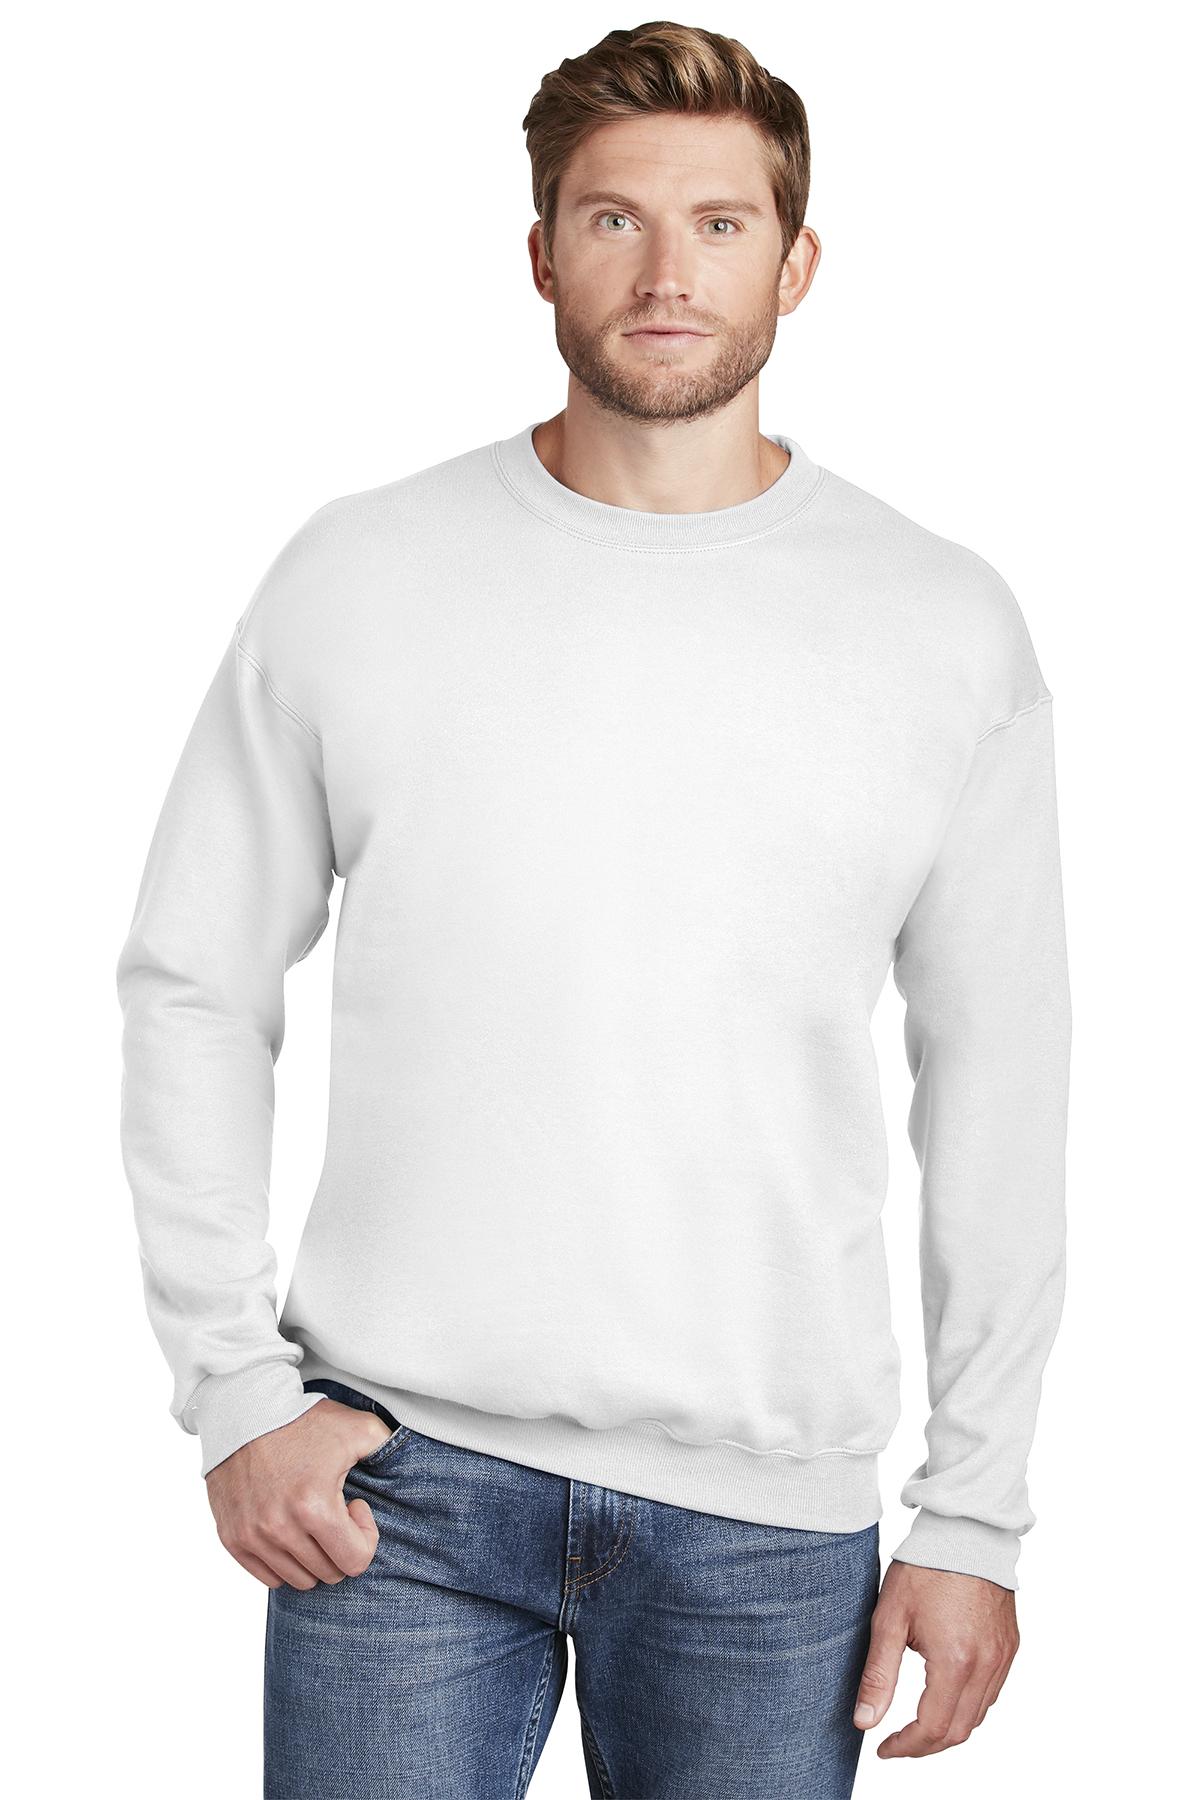 Hanes Mens PrintProXP Ultimate Cotton Crewneck Sweatshirt F260 Up to 3XL